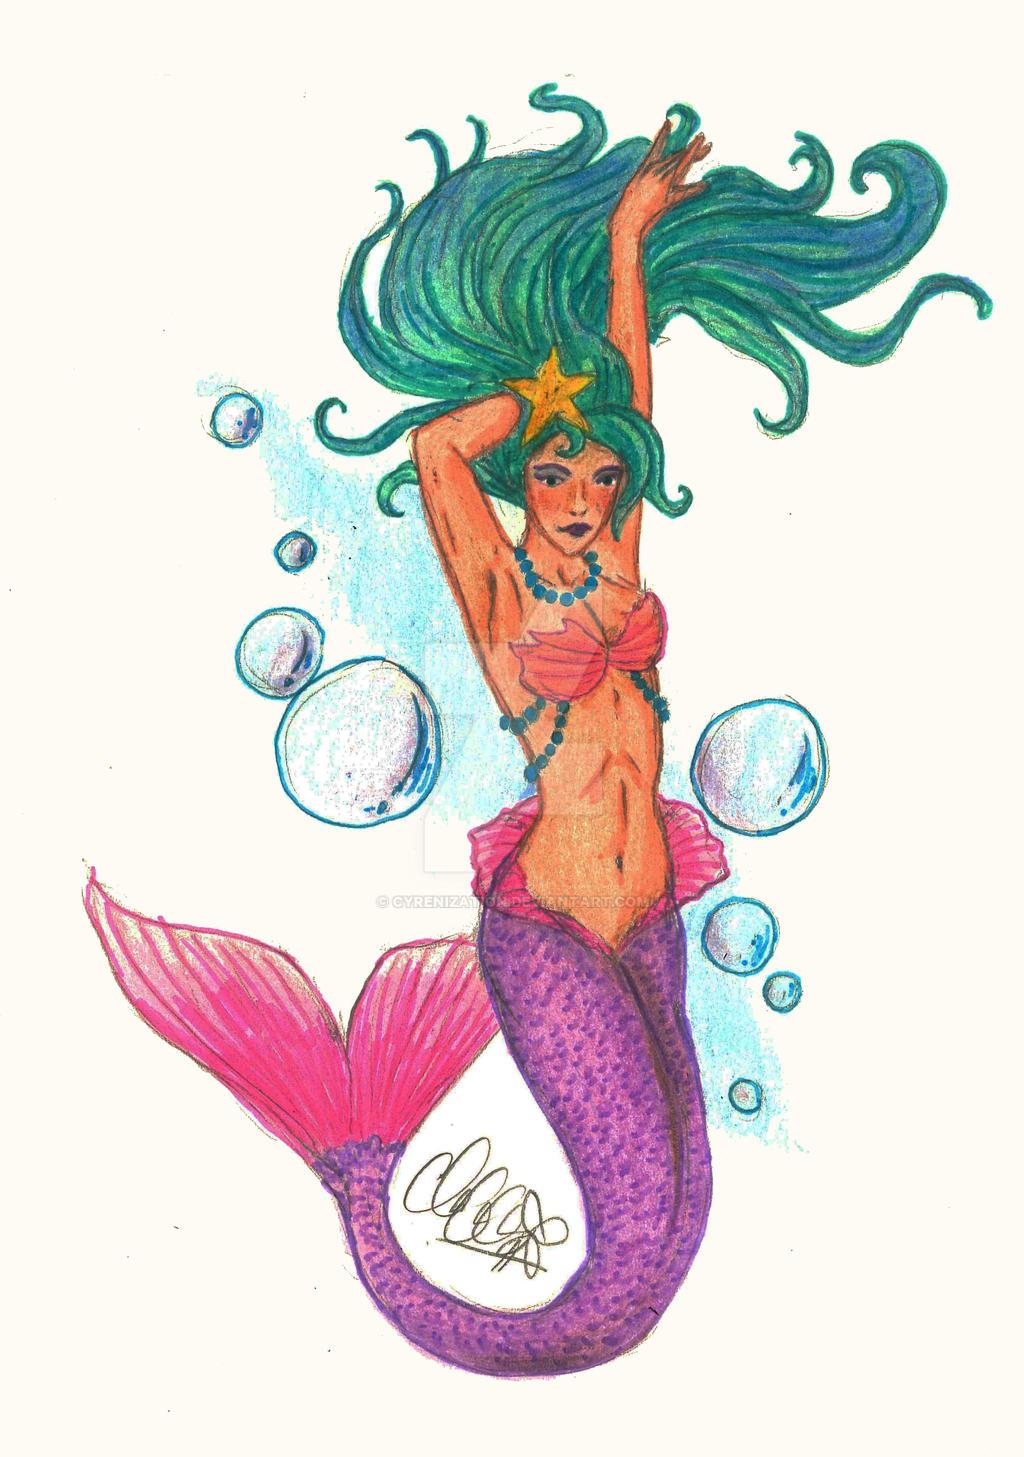 Bubbly mermaid tattoo flash by cyrenization on deviantart for Traditional mermaid tattoo